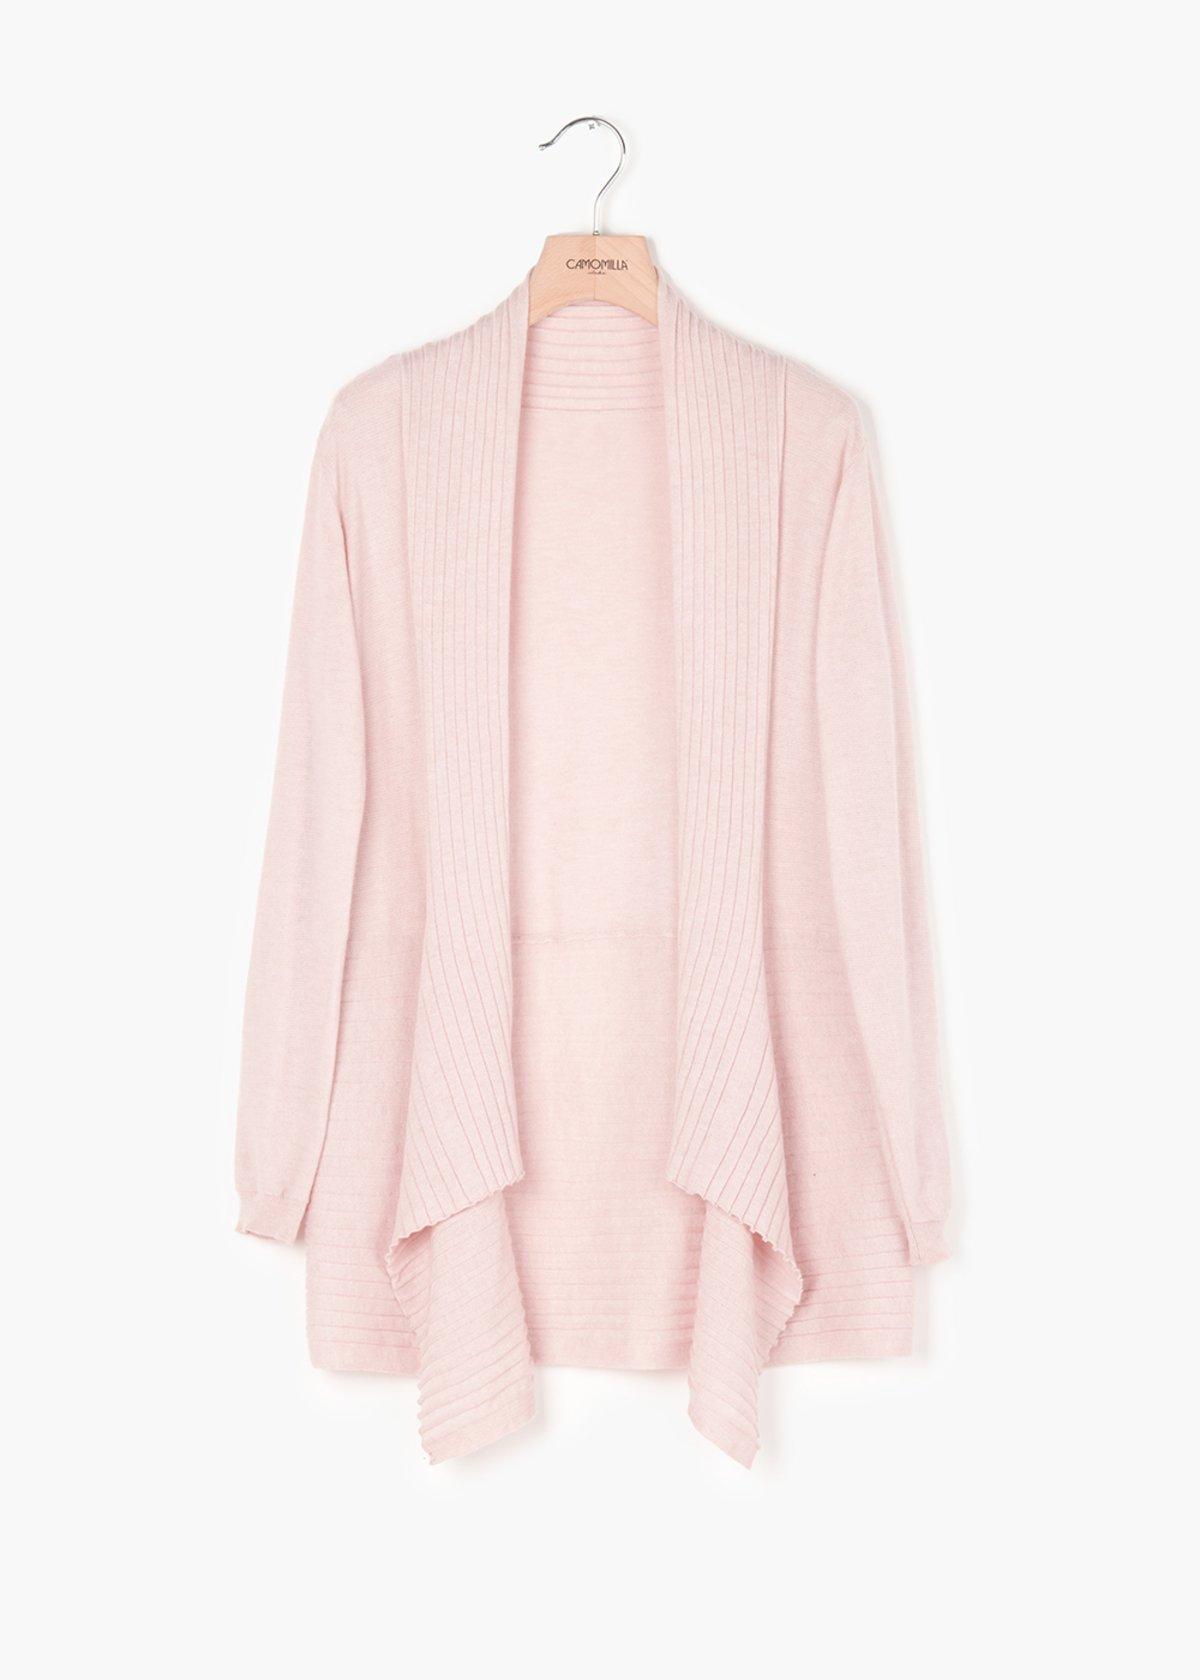 Camil asymmetric cardigan in wool blend - Sepia - Woman